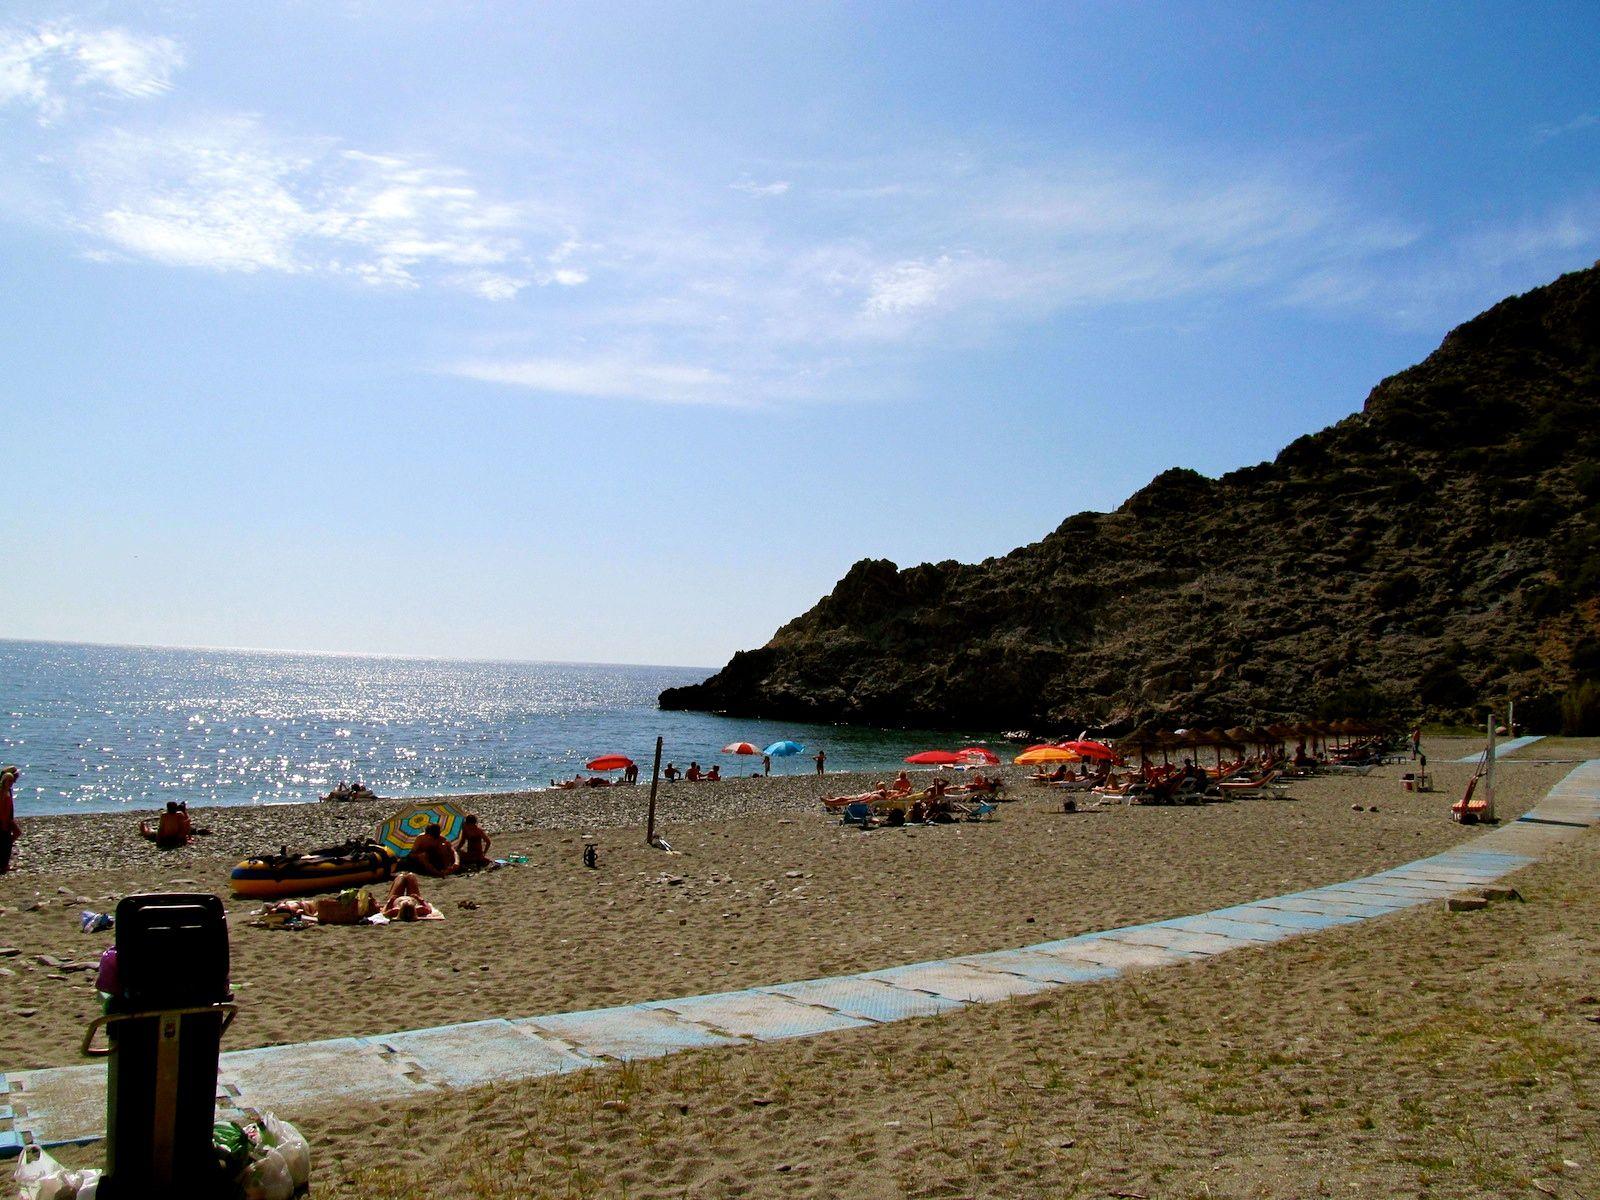 piste 2 playa, sierra nevada beach in a day, beach, cantarrijan, roadtrip